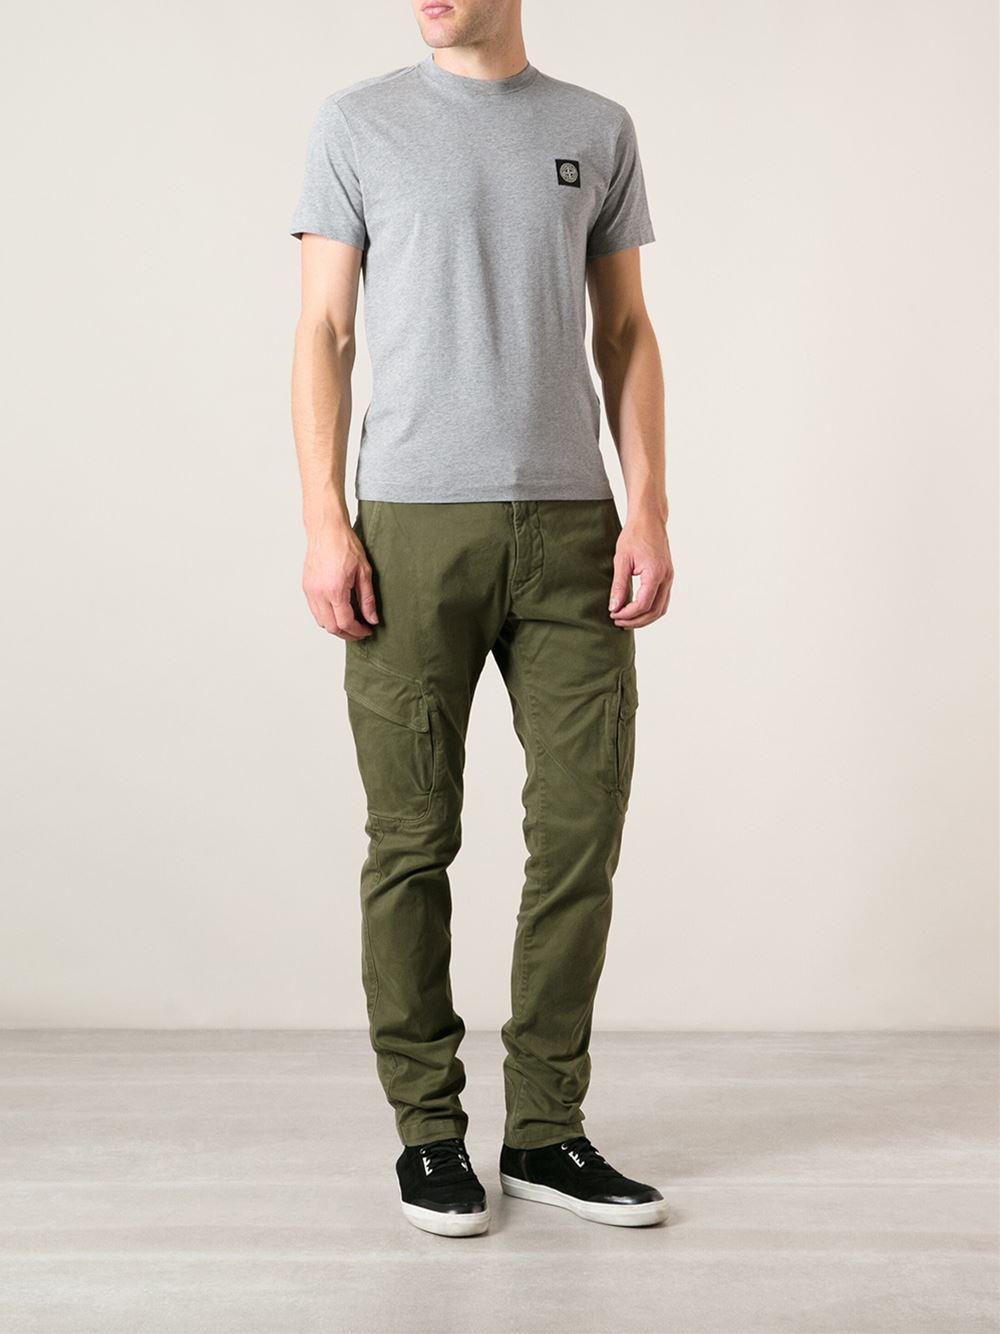 Lyst - Stone Island Skinny Cargo Trousers in Green for Men